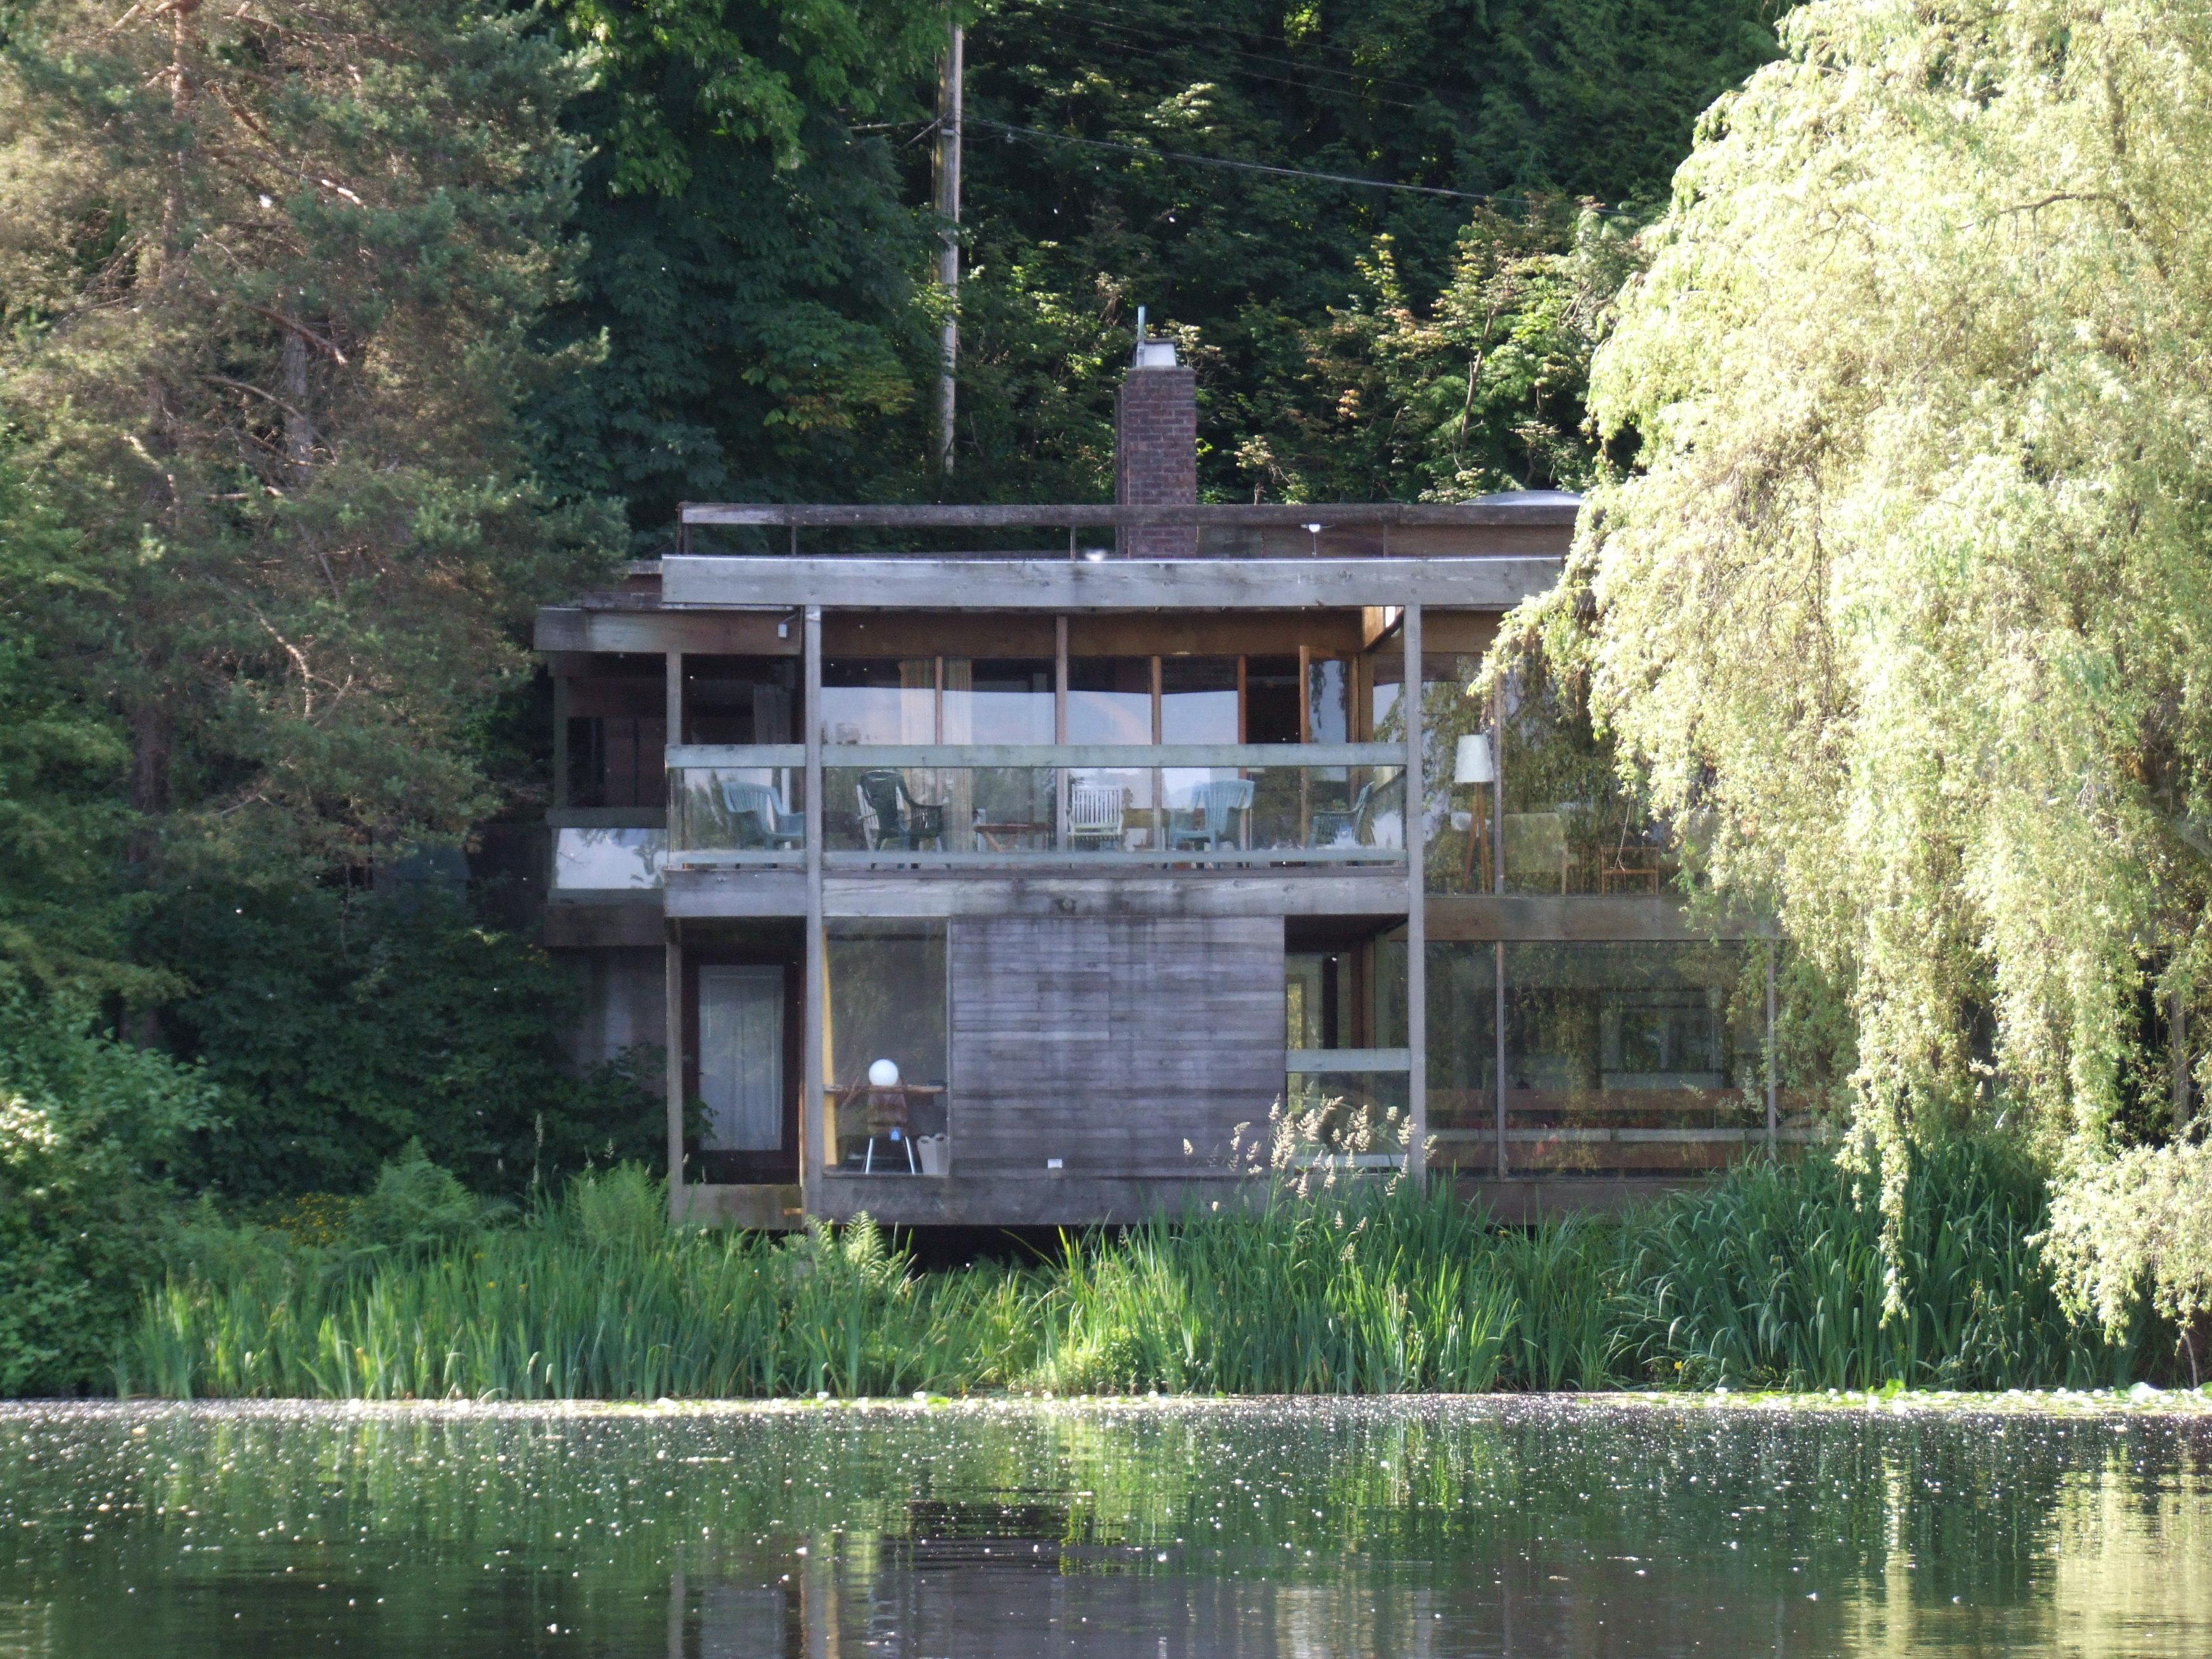 File:Baldwin House, Burnaby, BC 02.jpg - Wikimedia Commons